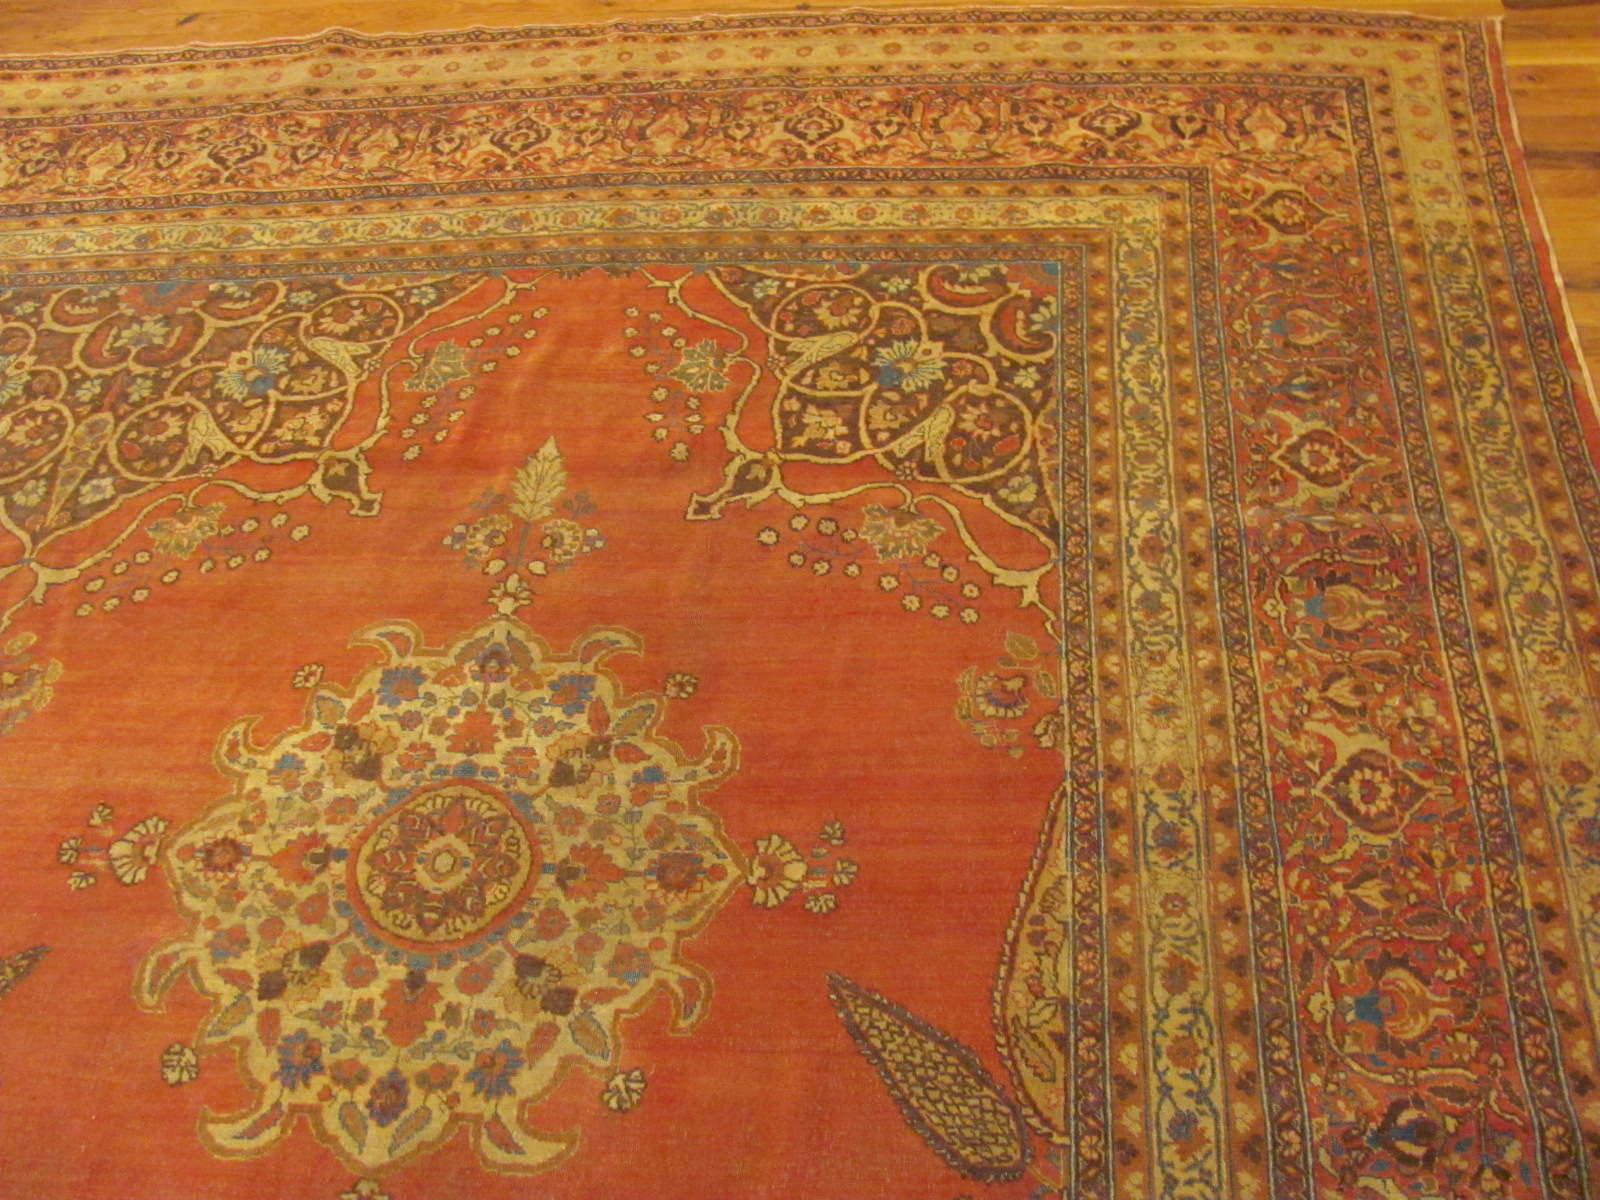 24345 antique Persian Tabriz carpet 10,9 x 14,4 -1